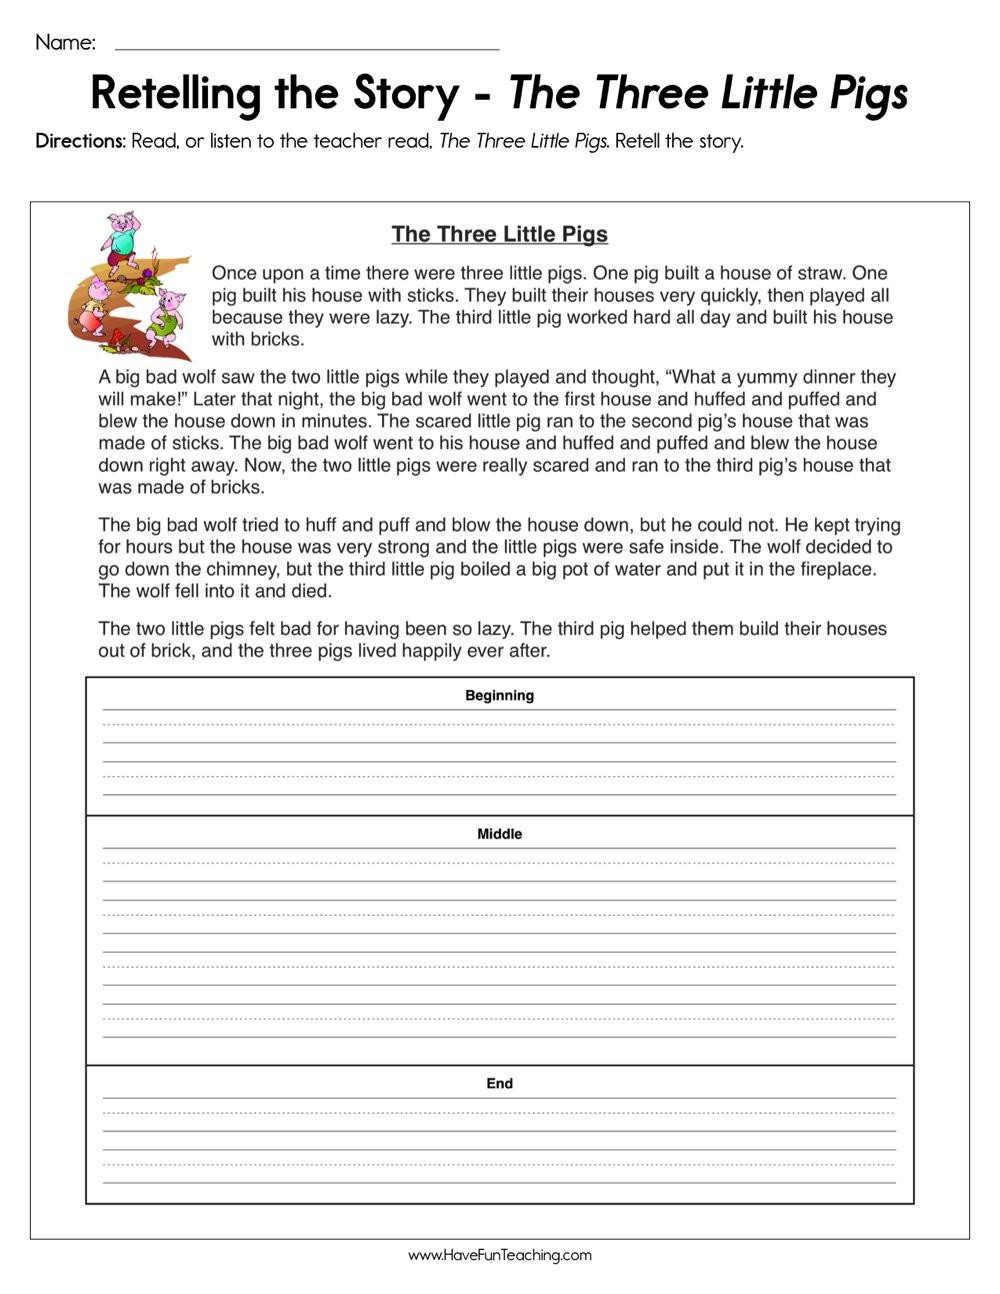 Summarizing Worksheet 4th Grade Retelling the Story the Three Little Pigs Worksheet